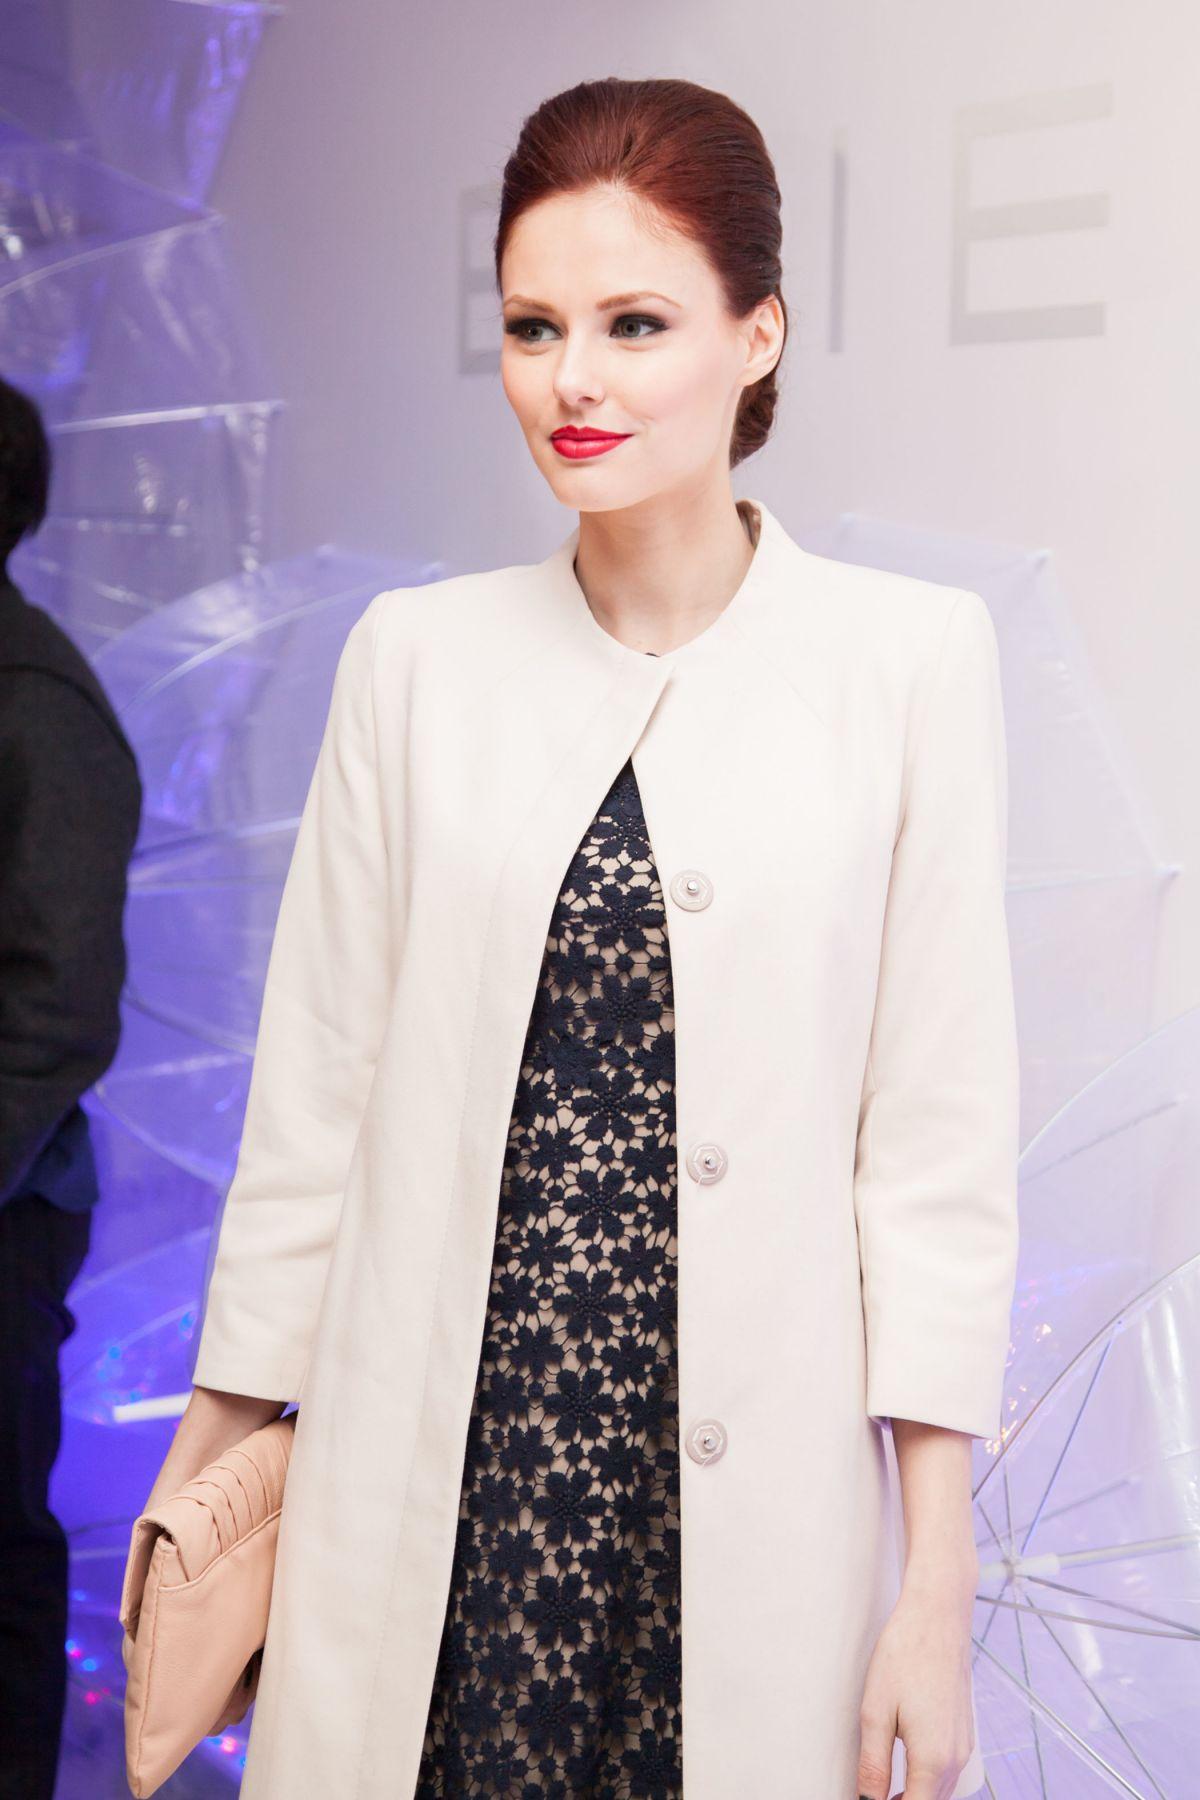 ALYSSA CAMPANELLA at Elie Tahari Fashion Show in New York